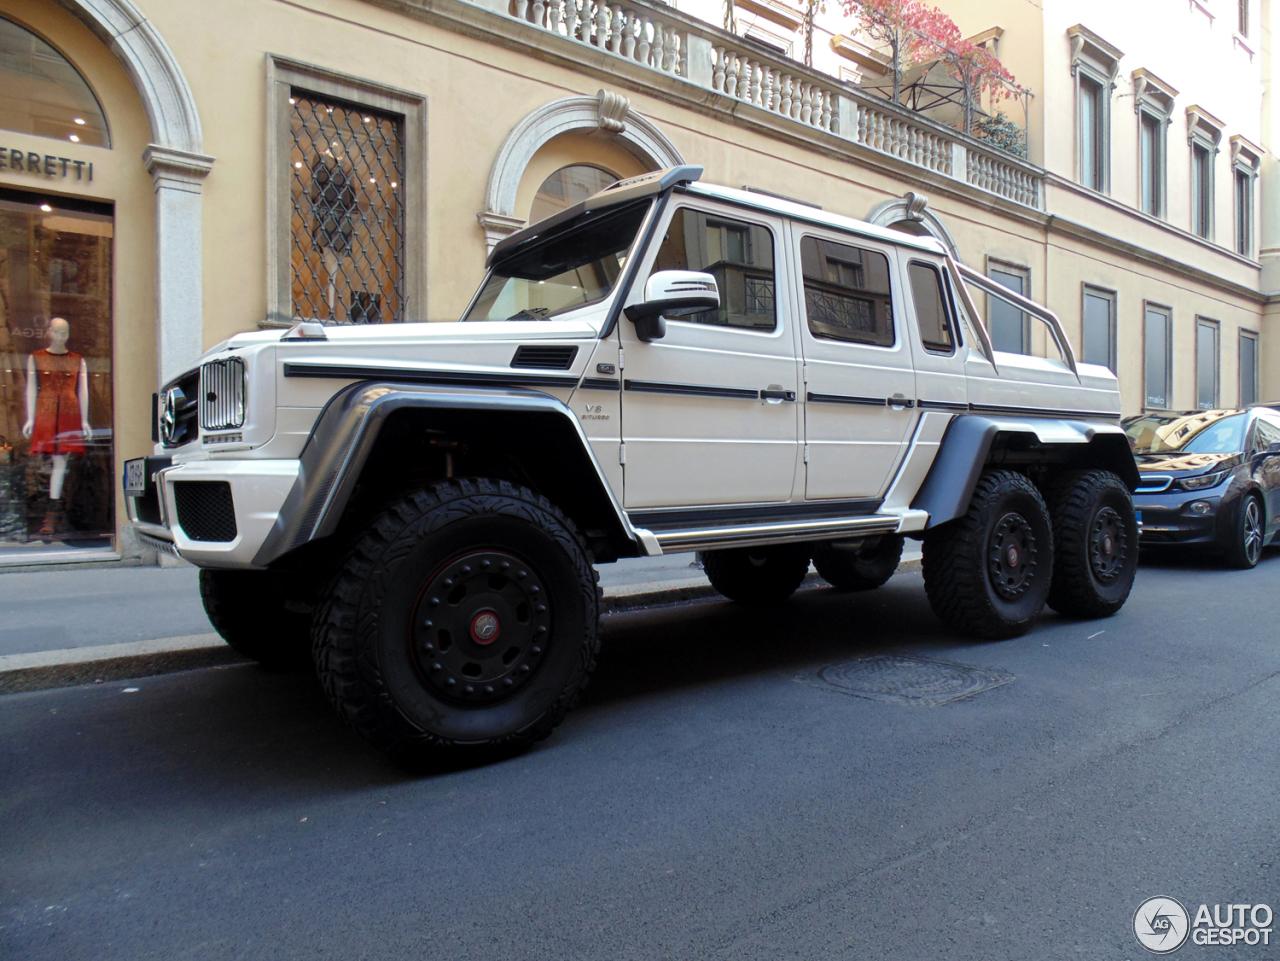 Mercedes benz g 63 amg 6x6 18 october 2014 autogespot for Mercedes benz g 63 amg 6x6